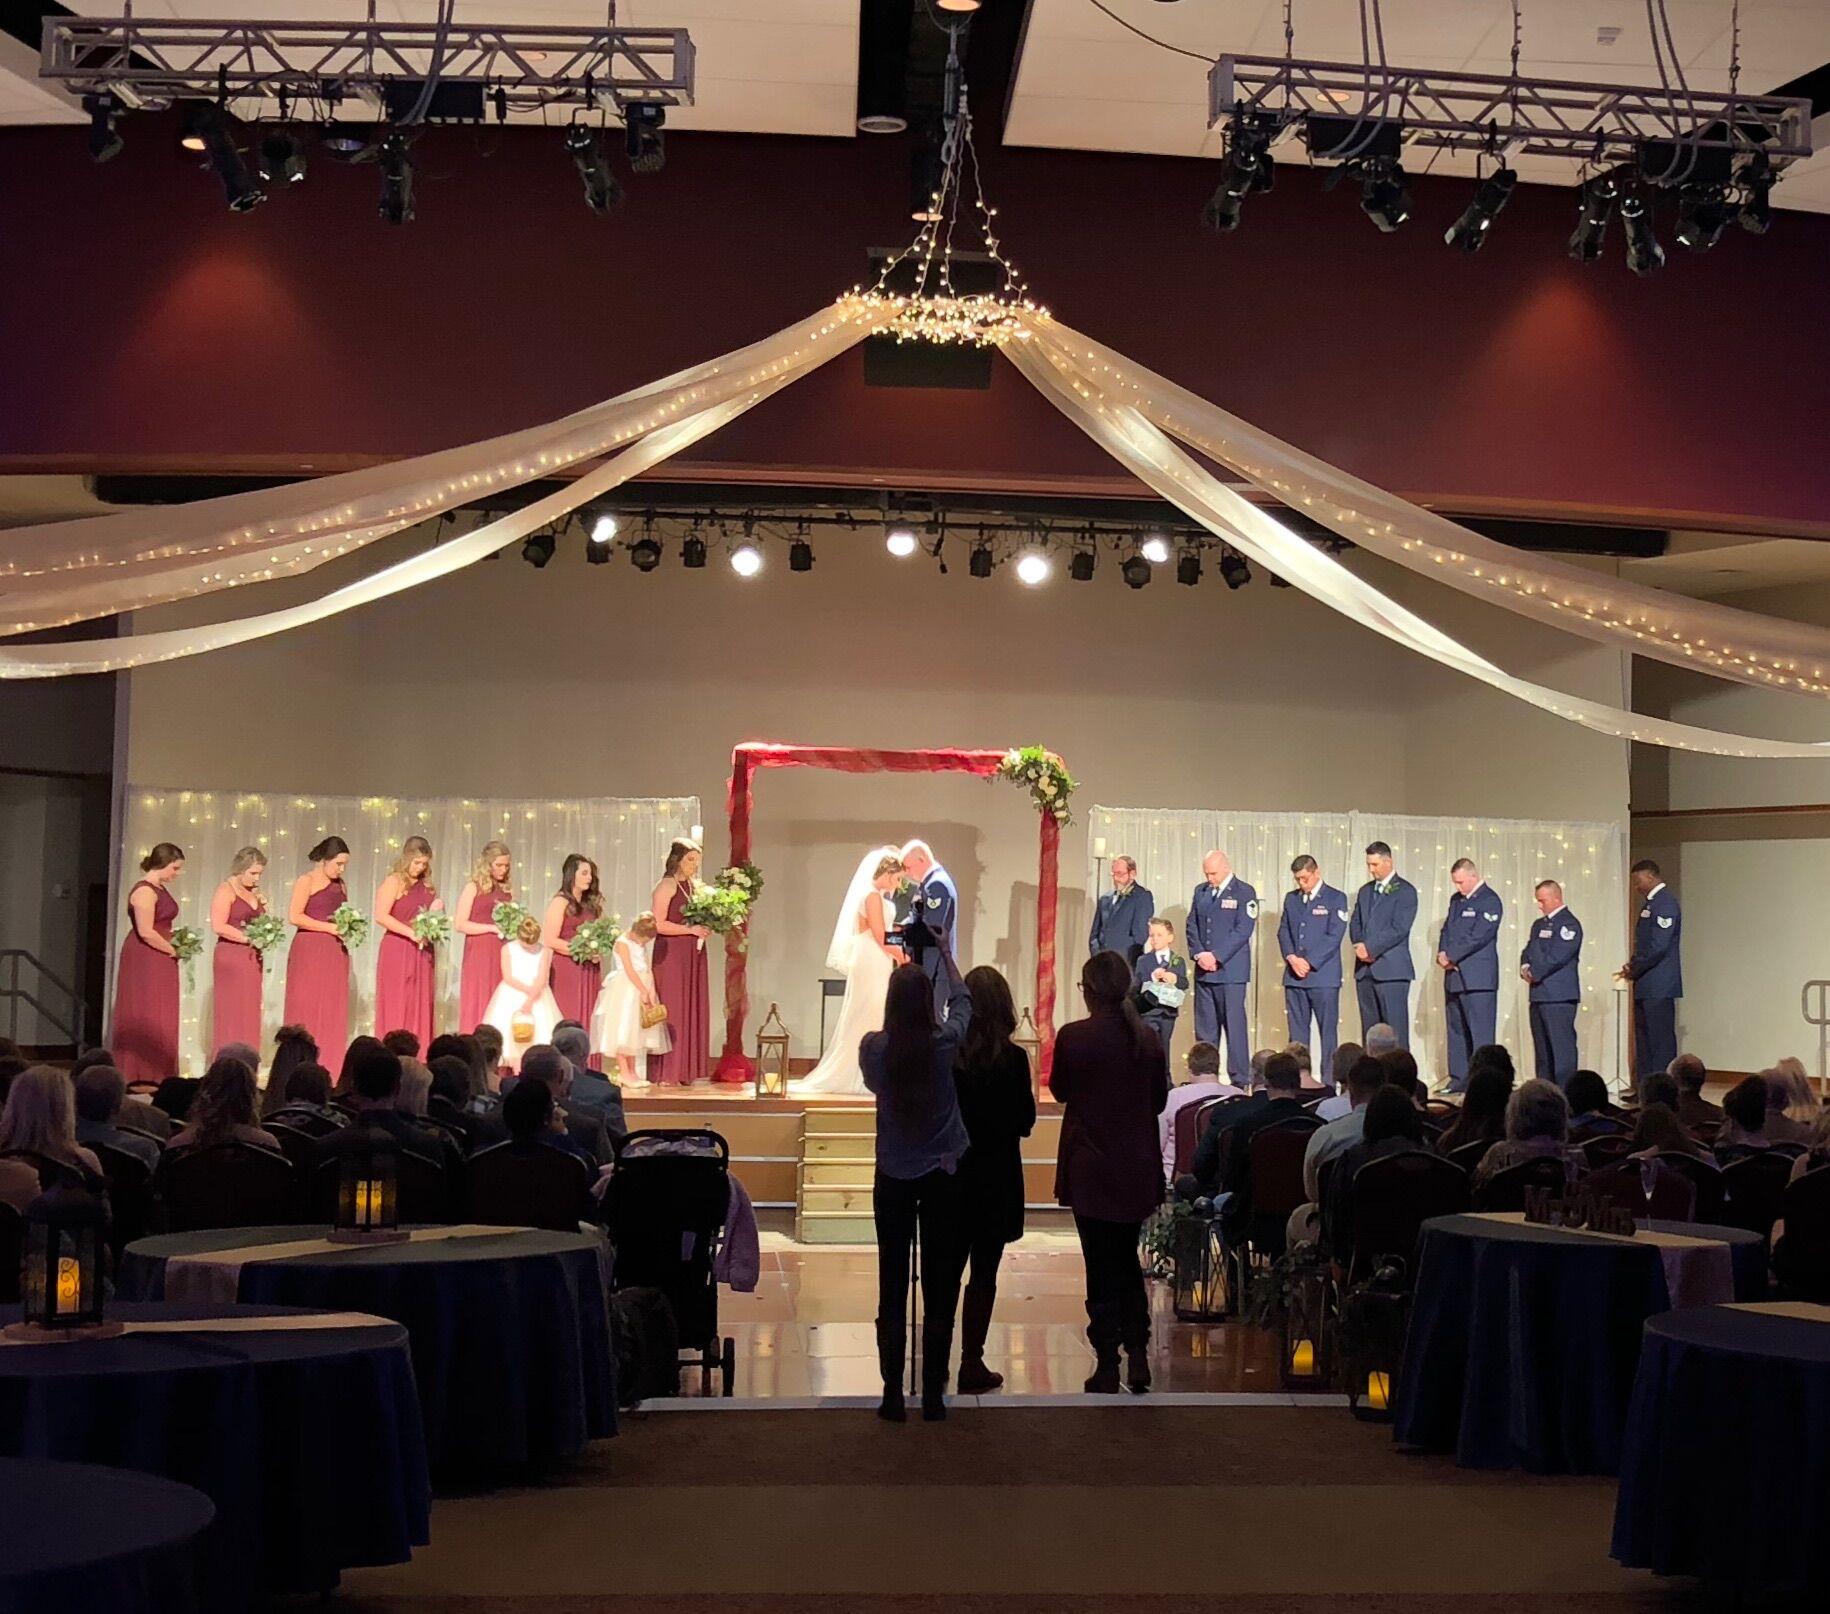 West Texas A&M University Wedding Venues   Reception Venues